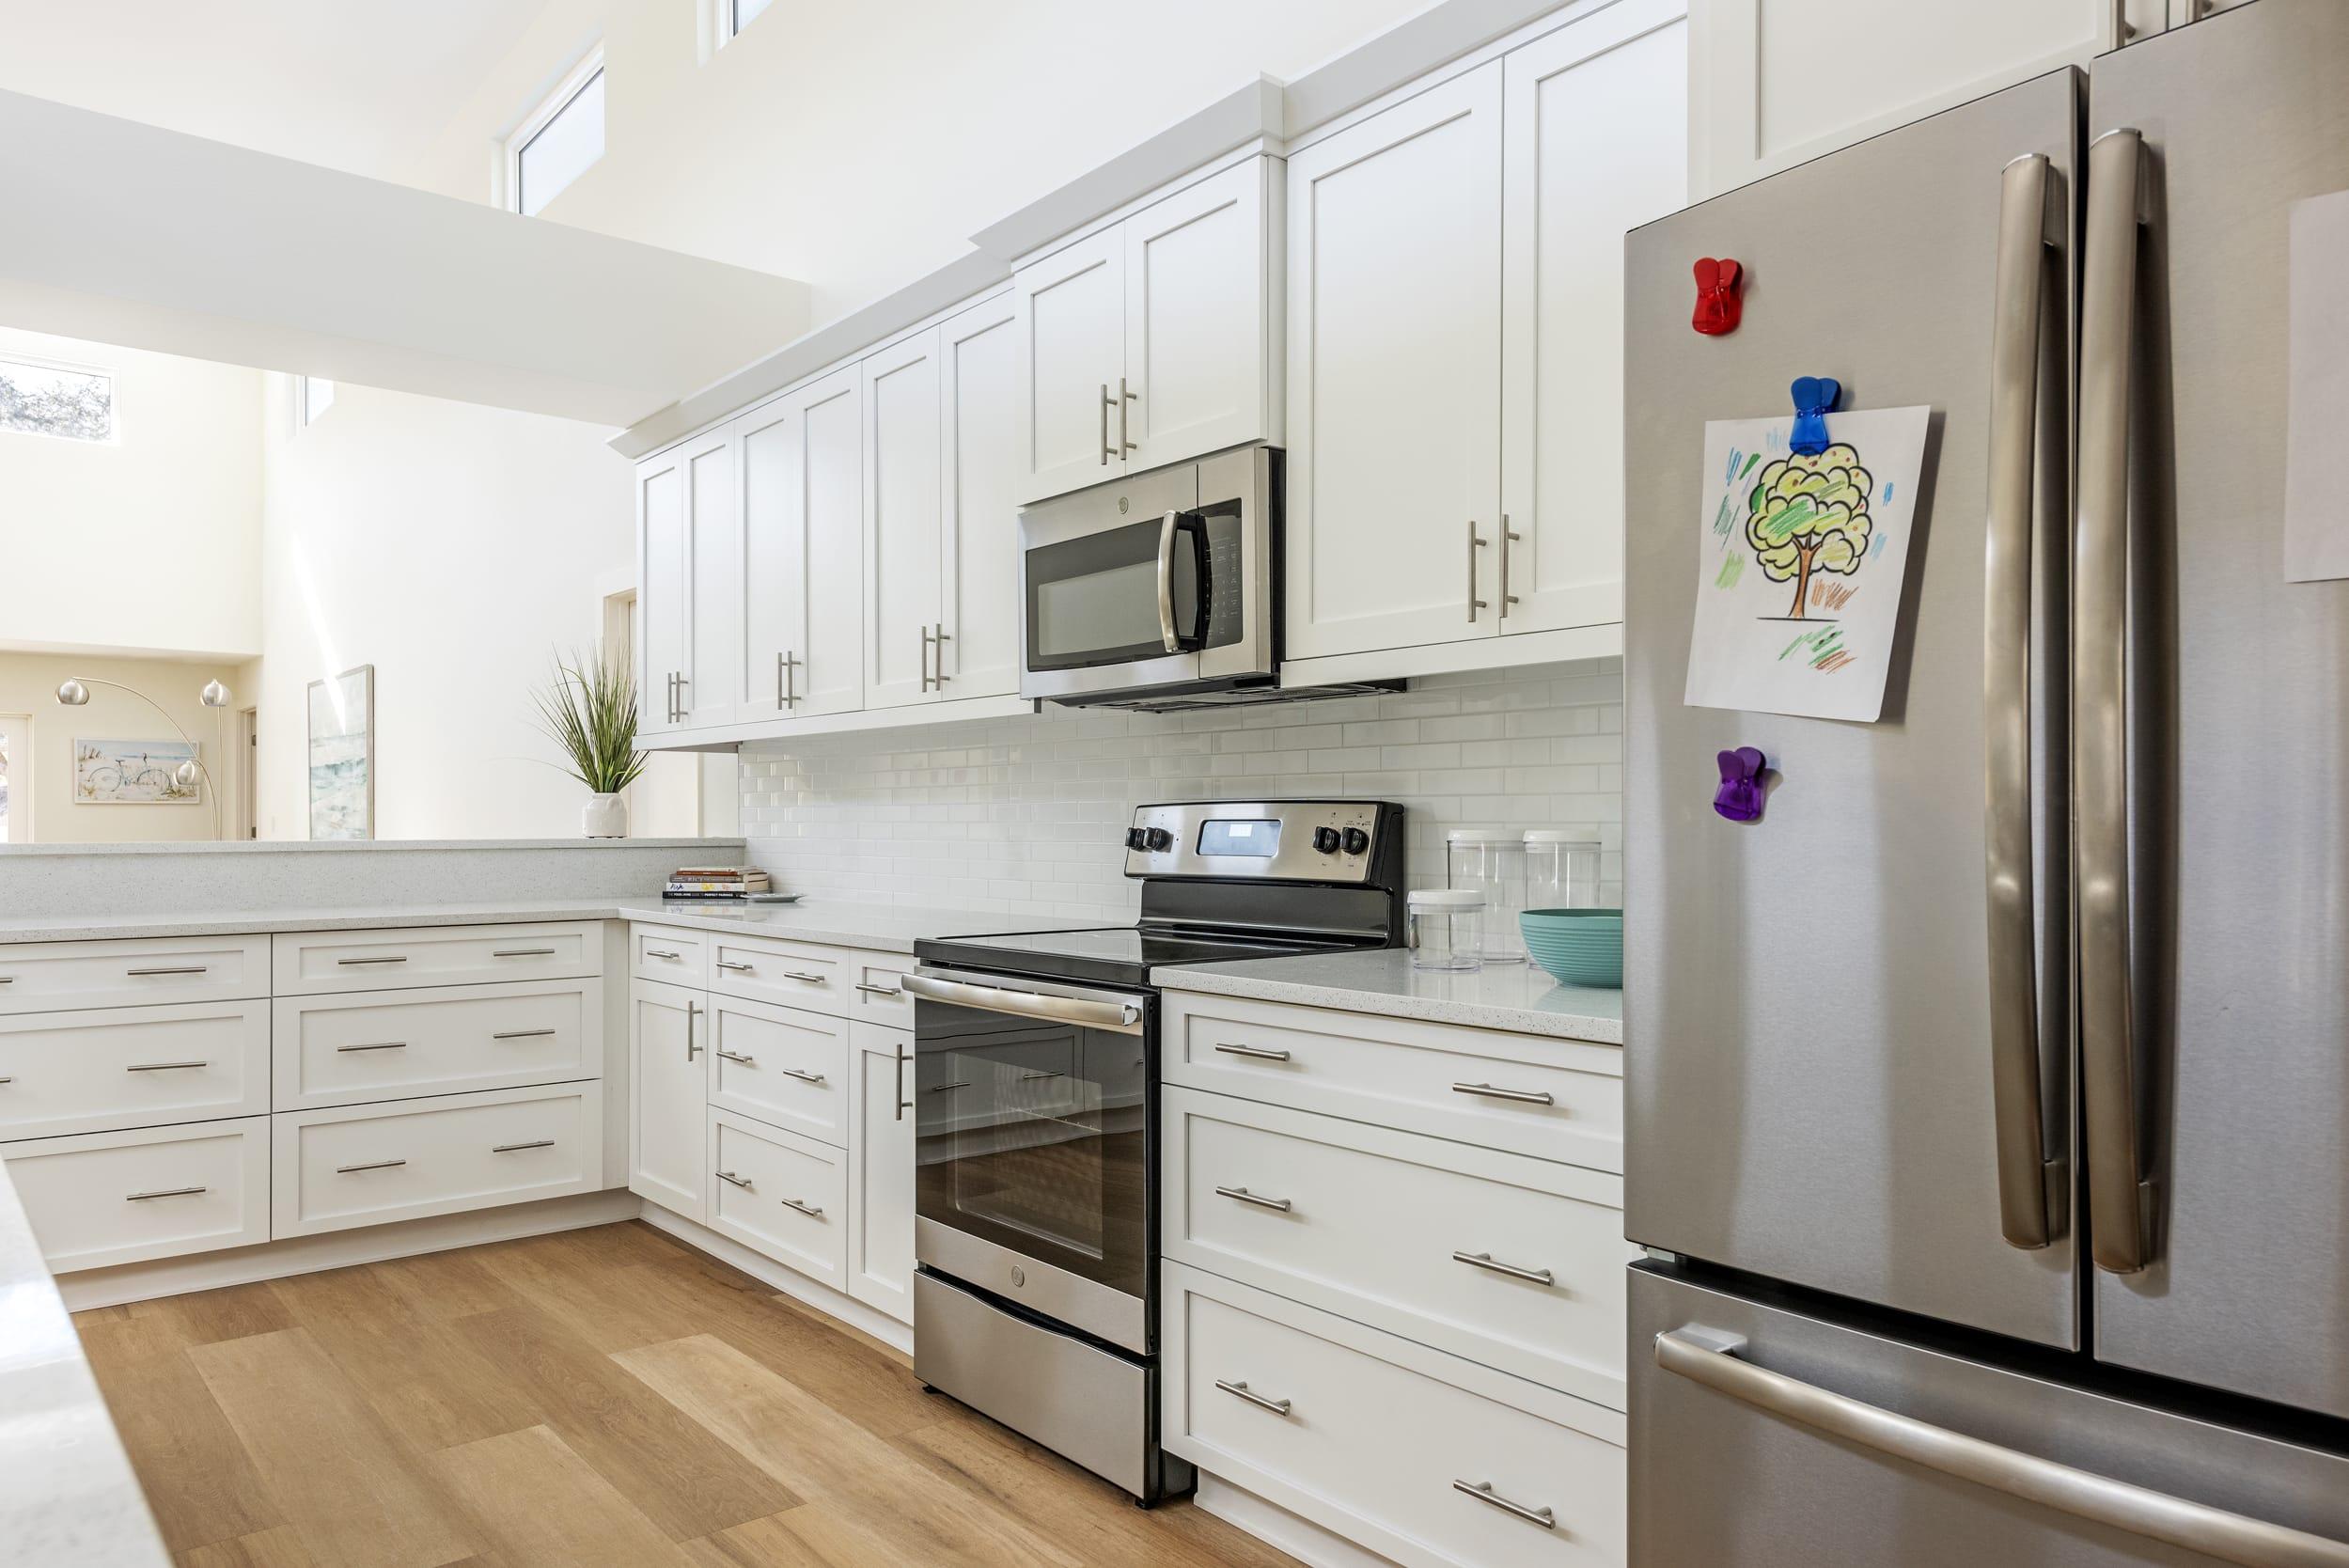 White Kitchen Cabinets Metalic Cooker Refrigerator